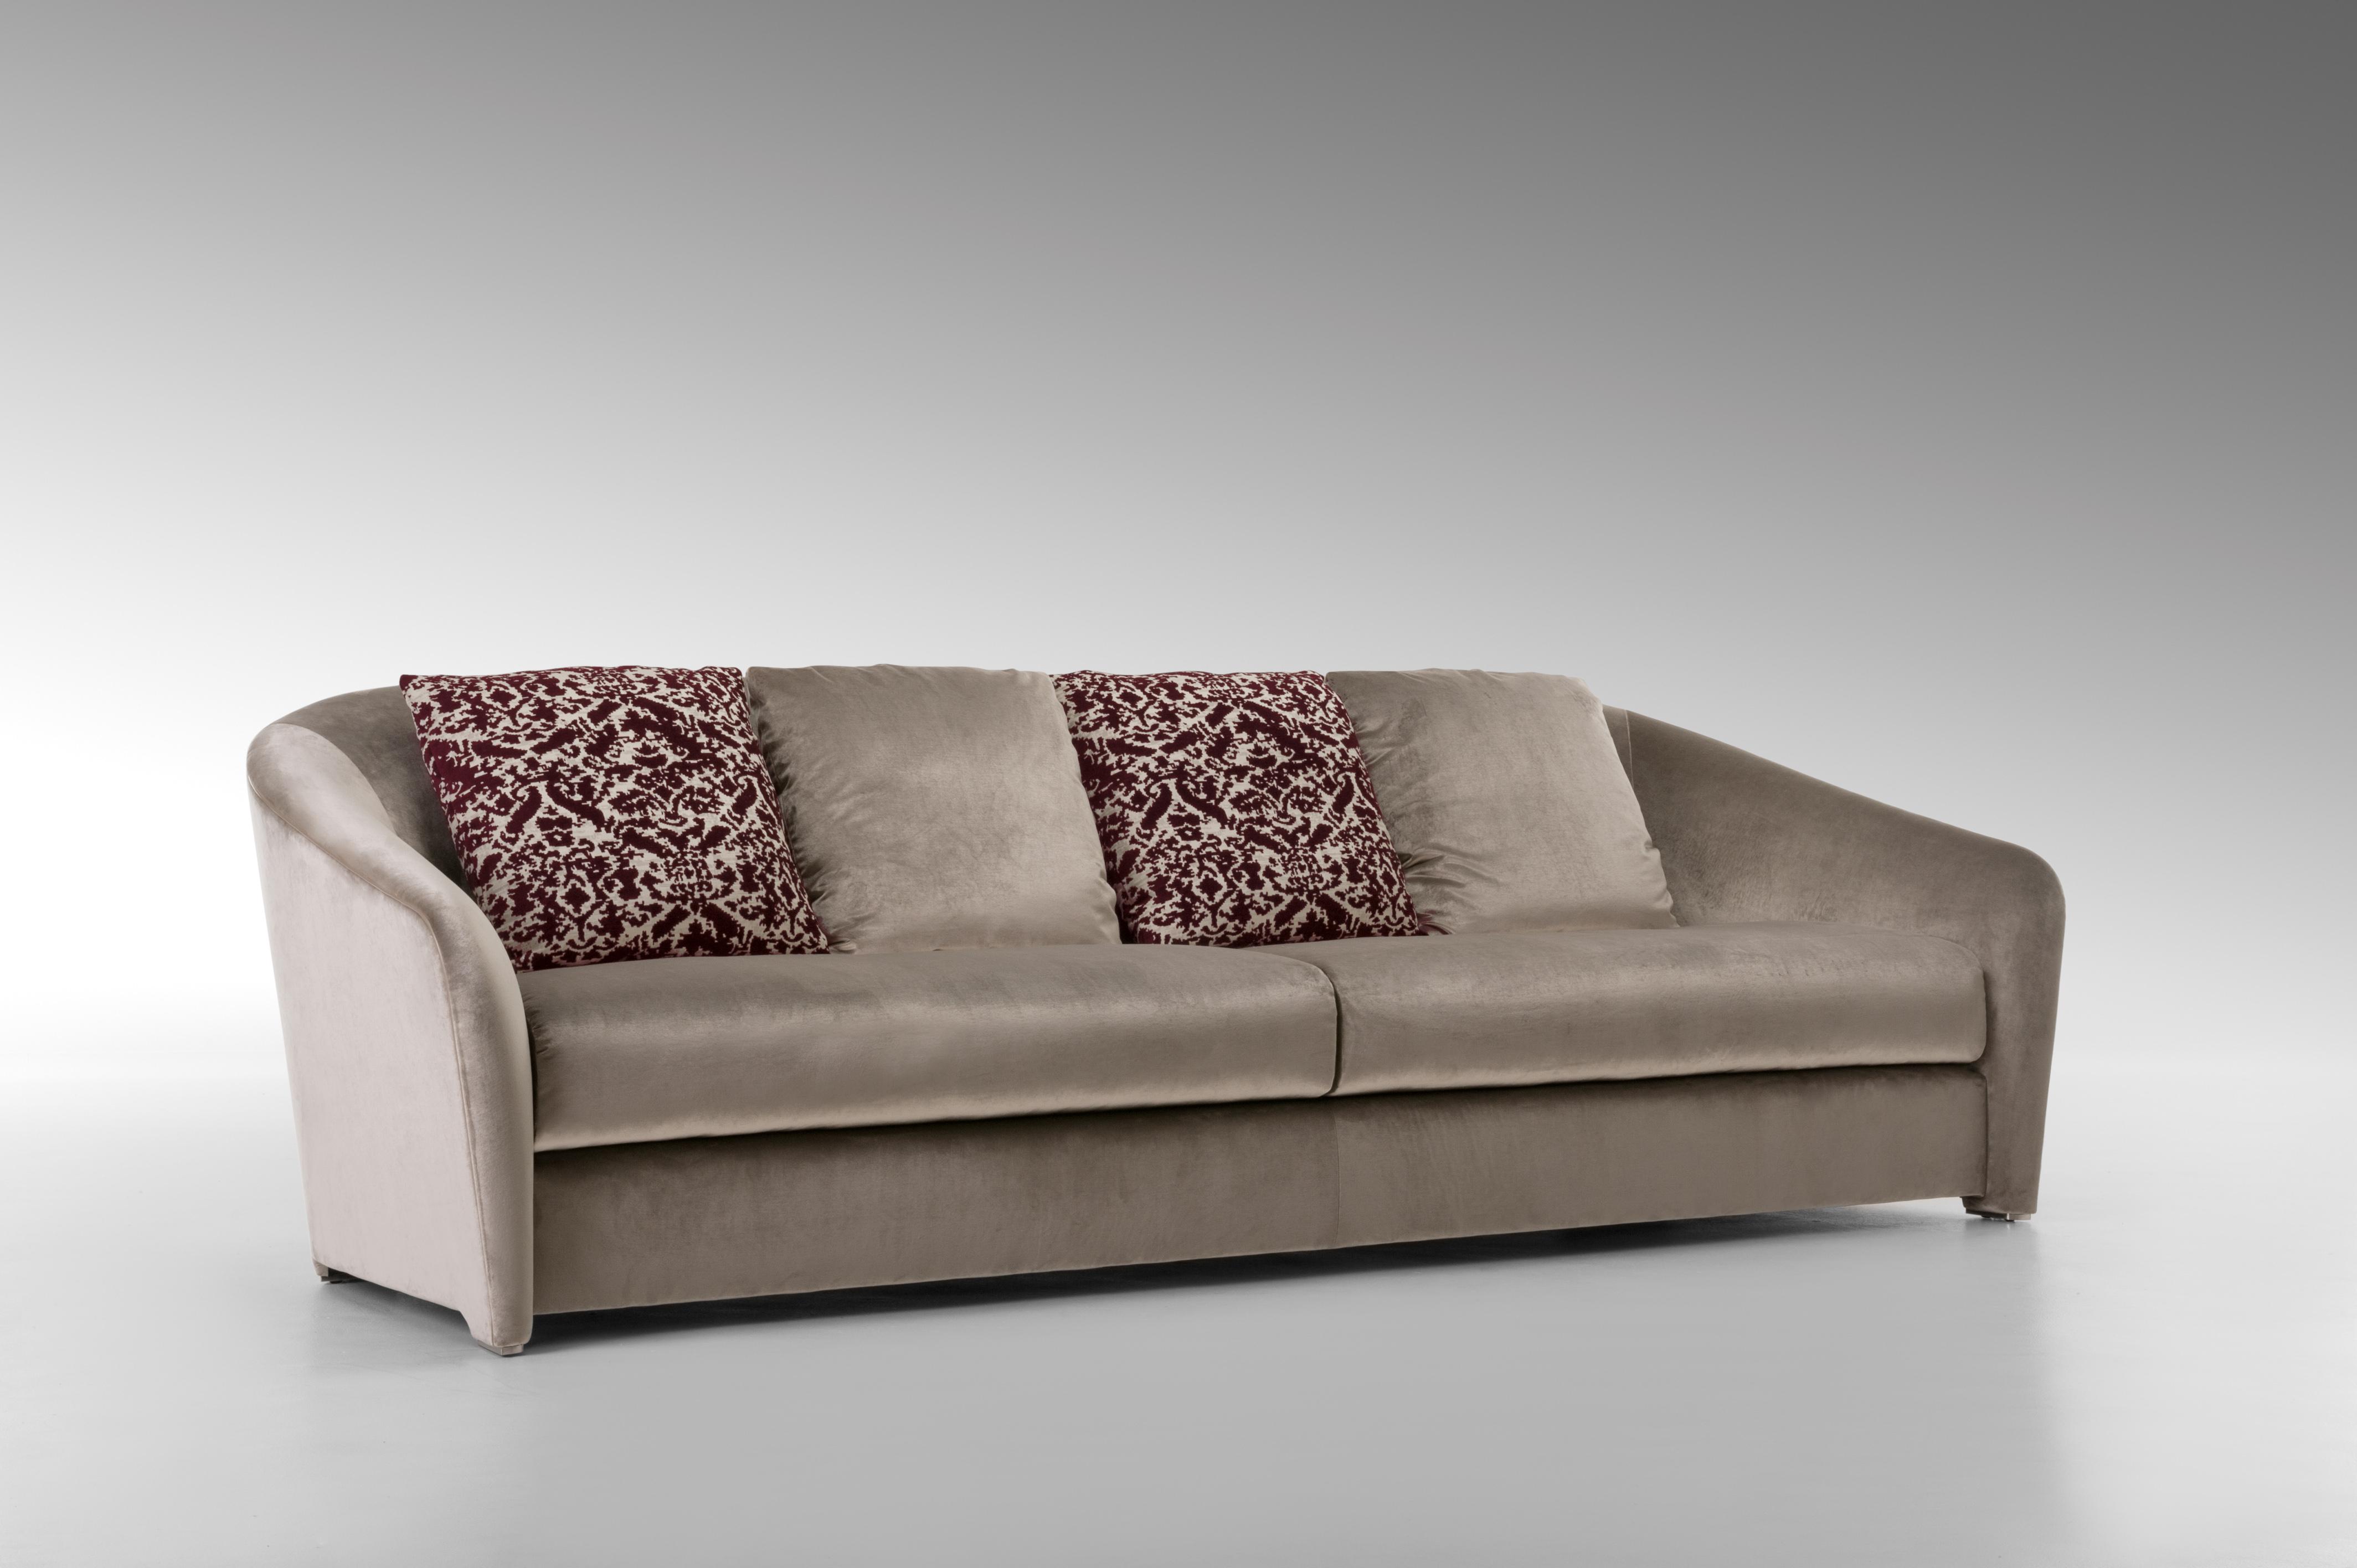 Fendi casa style by jpc for Sofa set designer collection